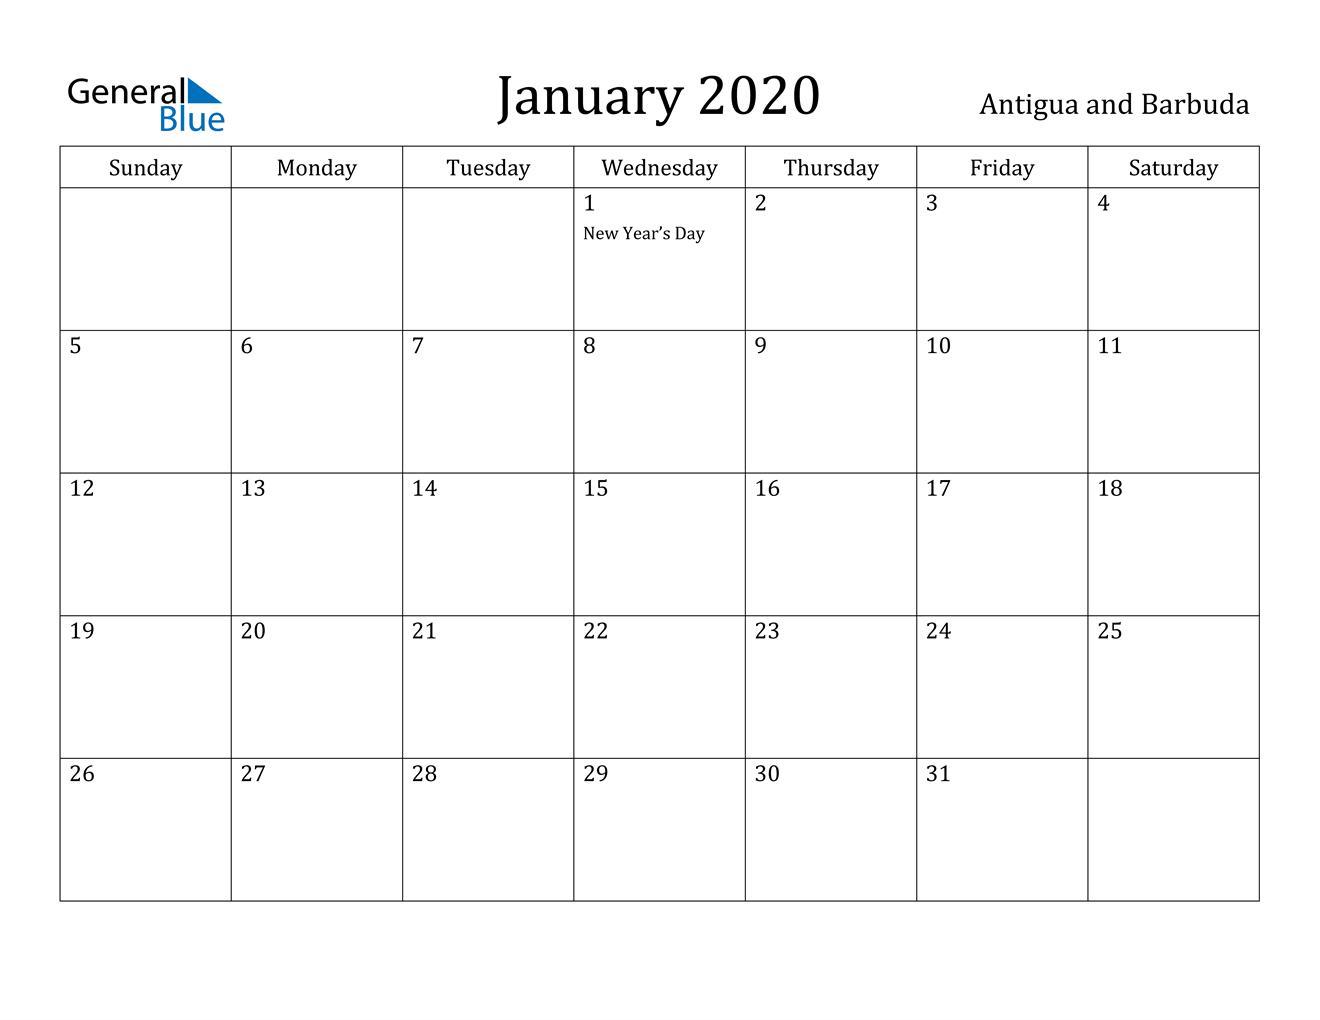 January 2020 Calendar - Antigua And Barbuda